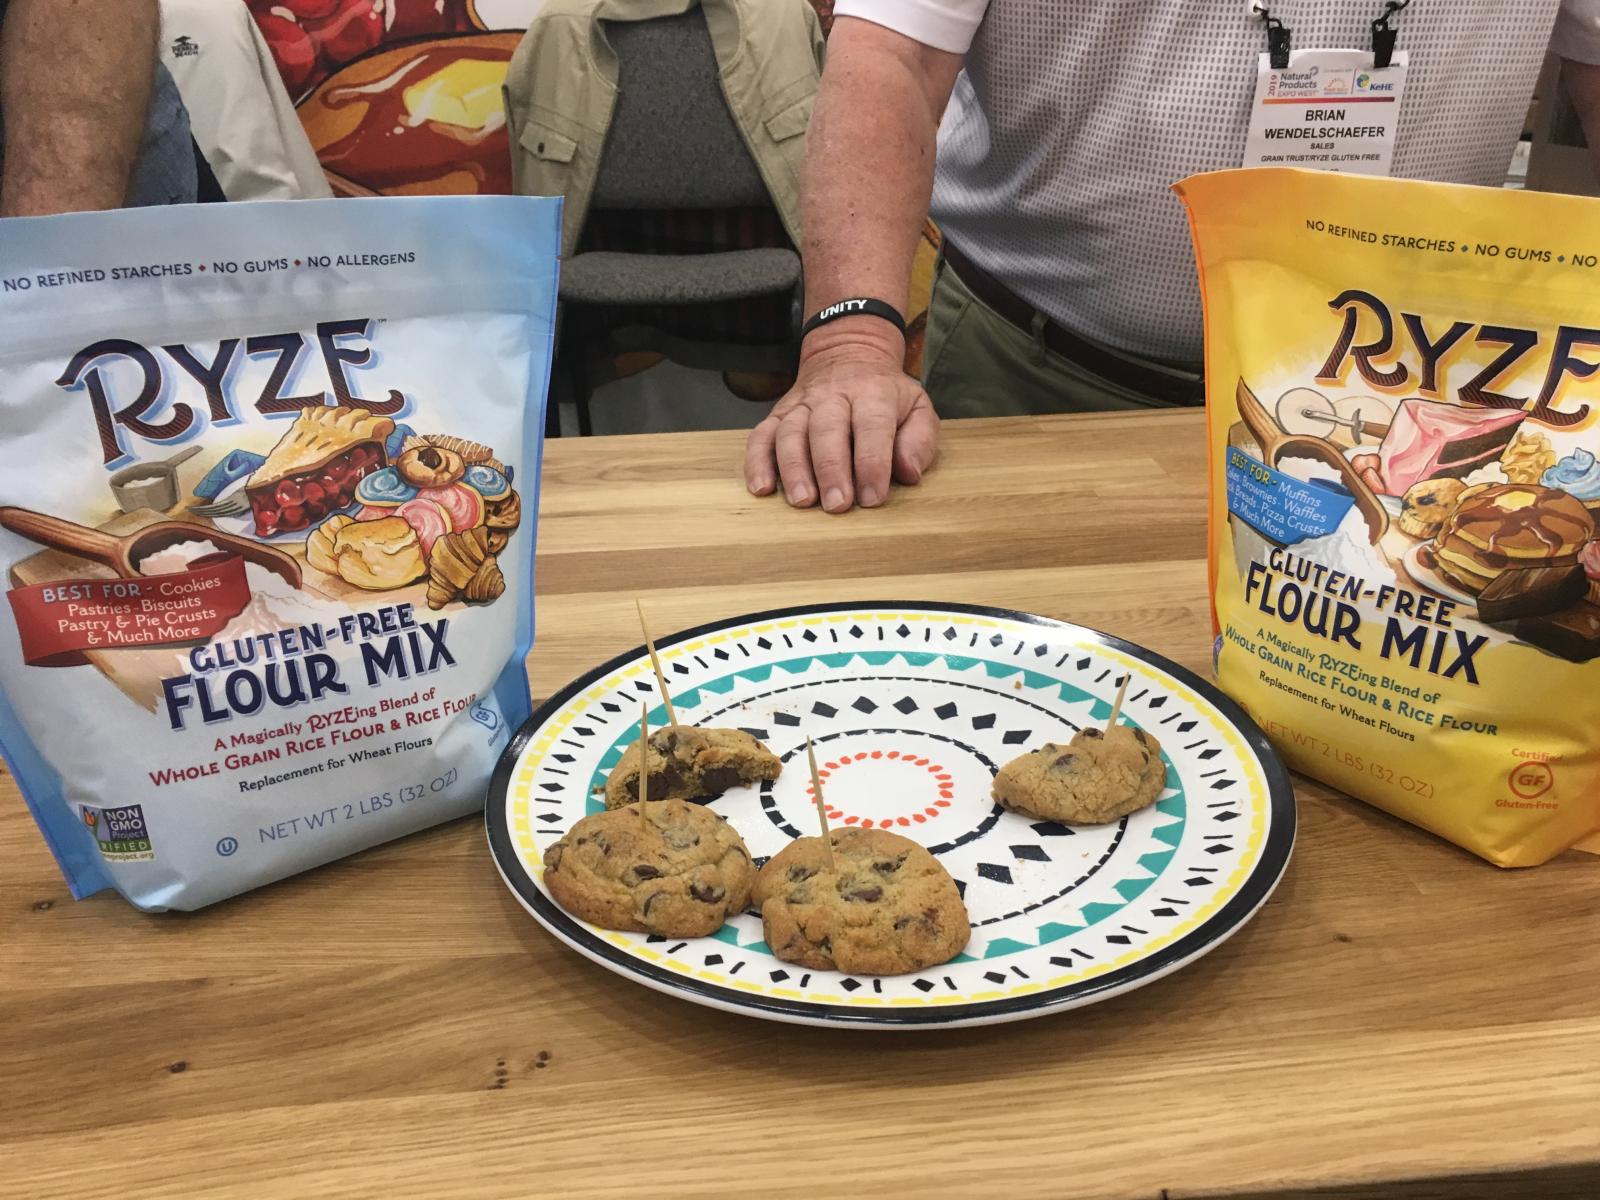 Ryze Gluten-Free Flour Mix